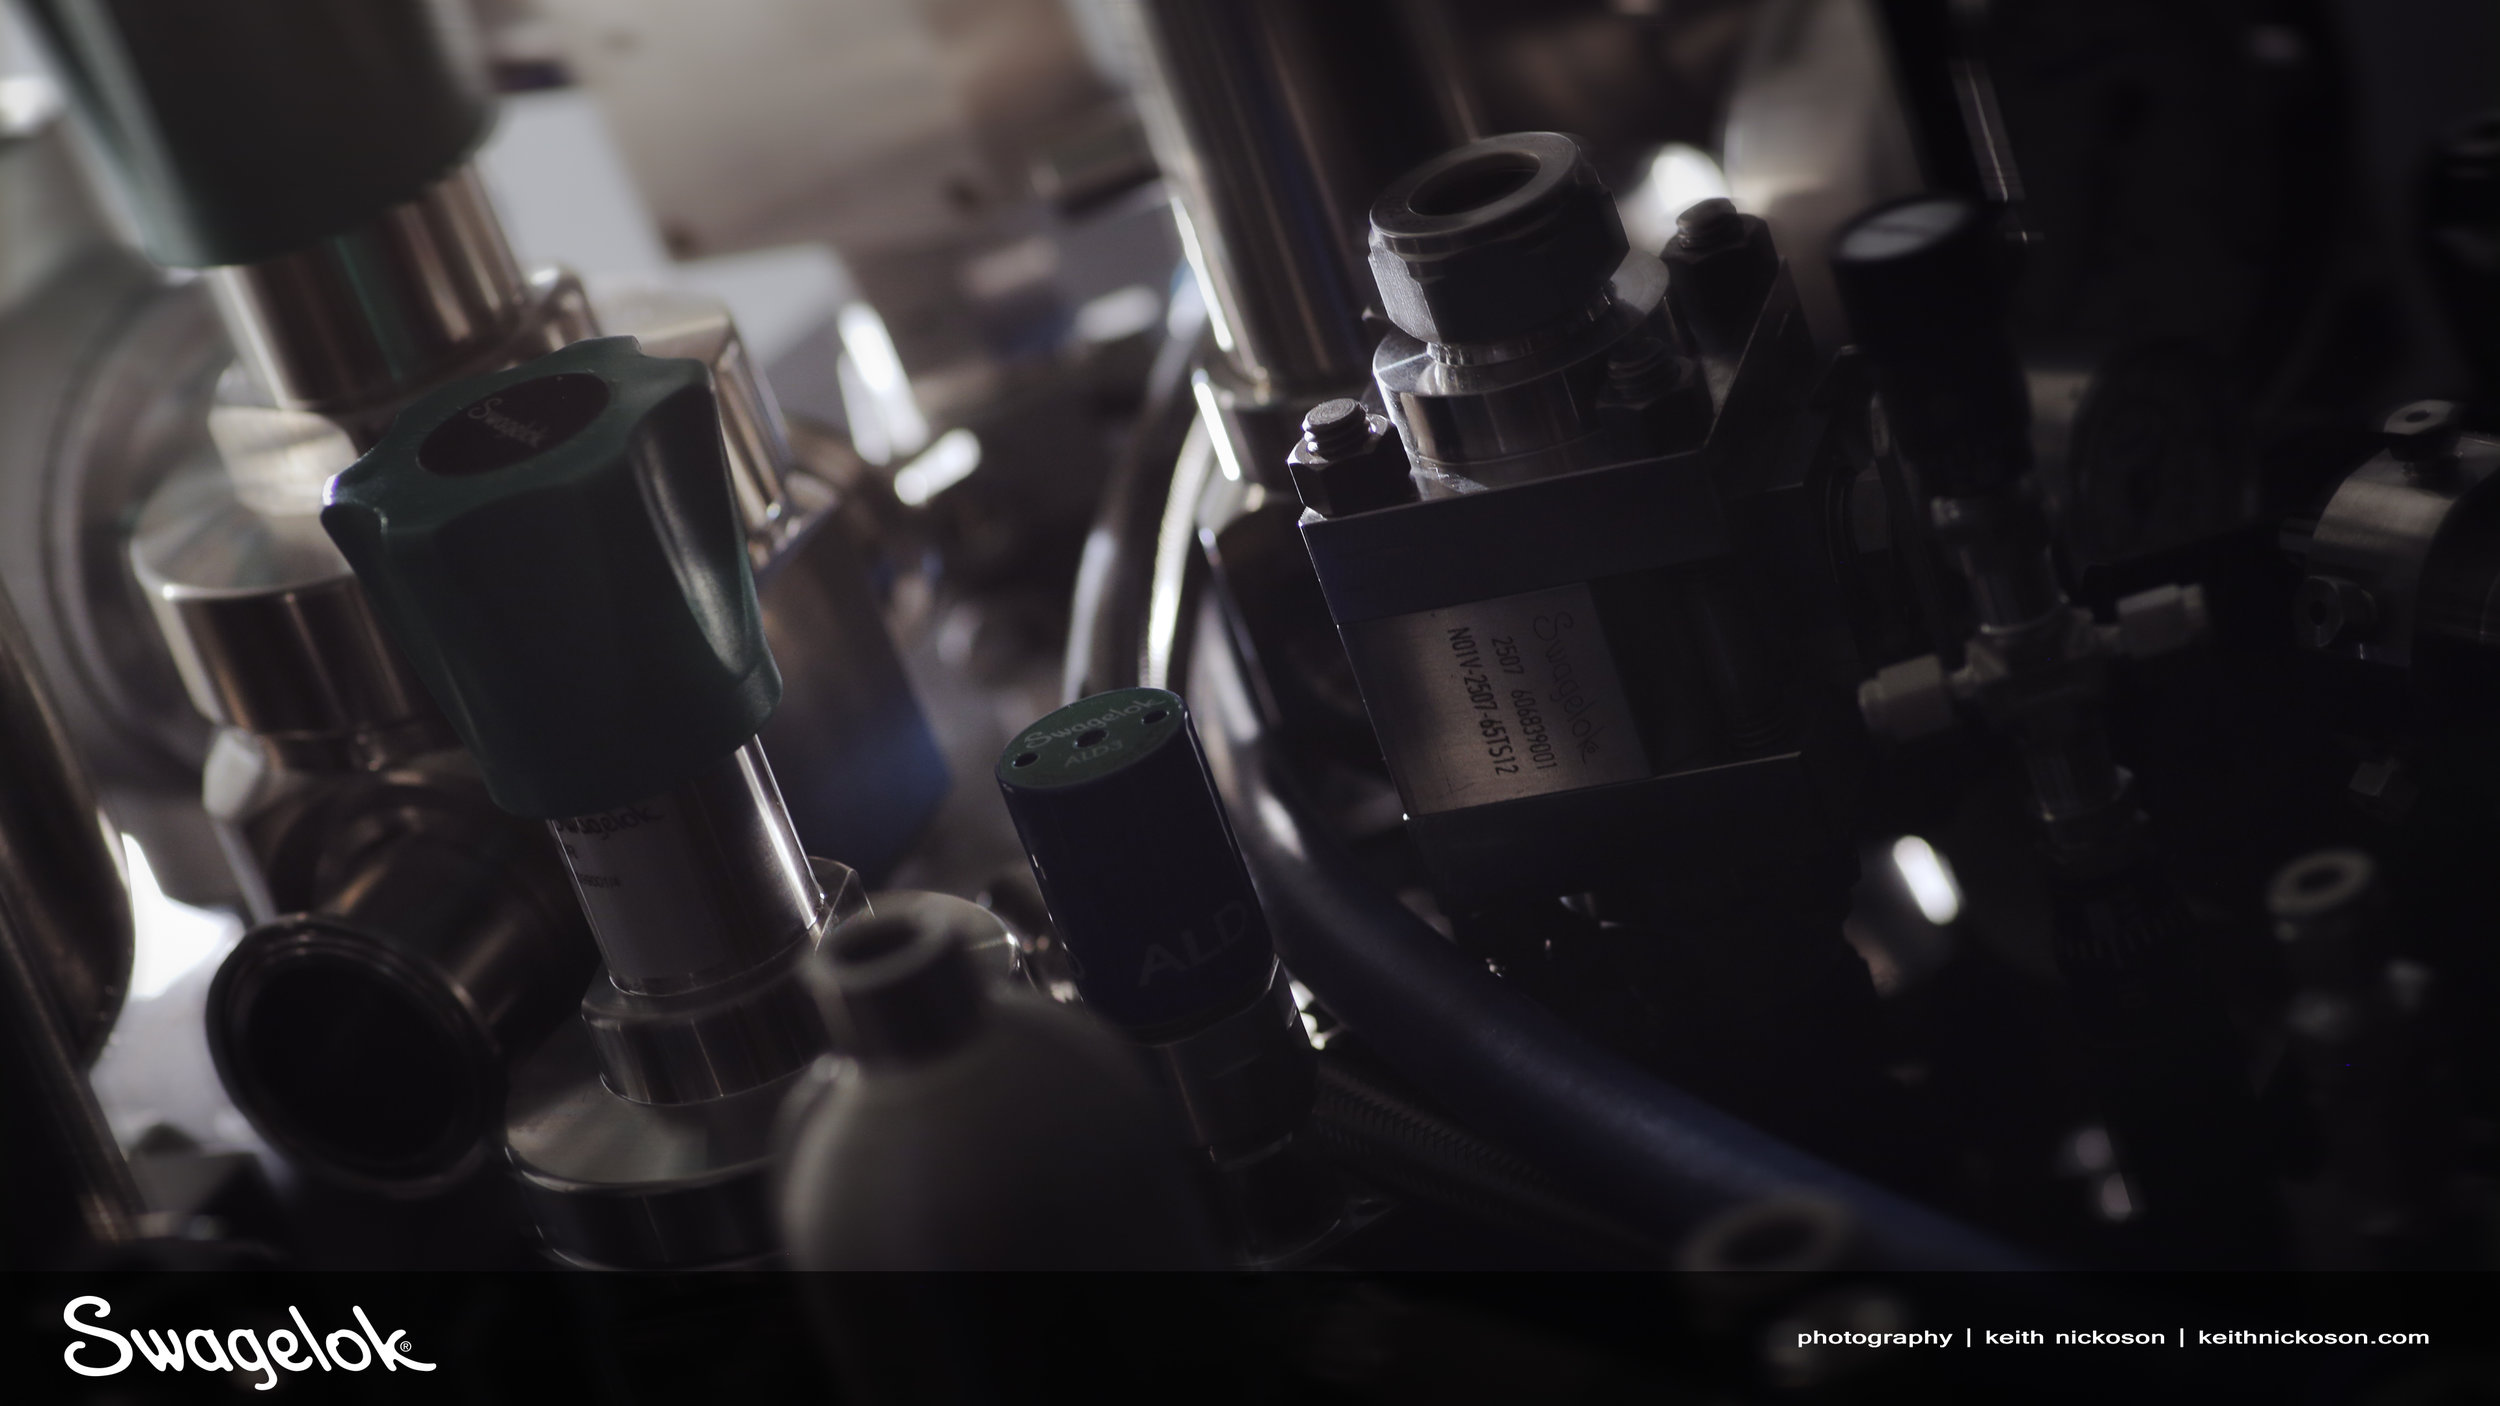 Swagelok Product 9 - Keith Nickoson.jpg